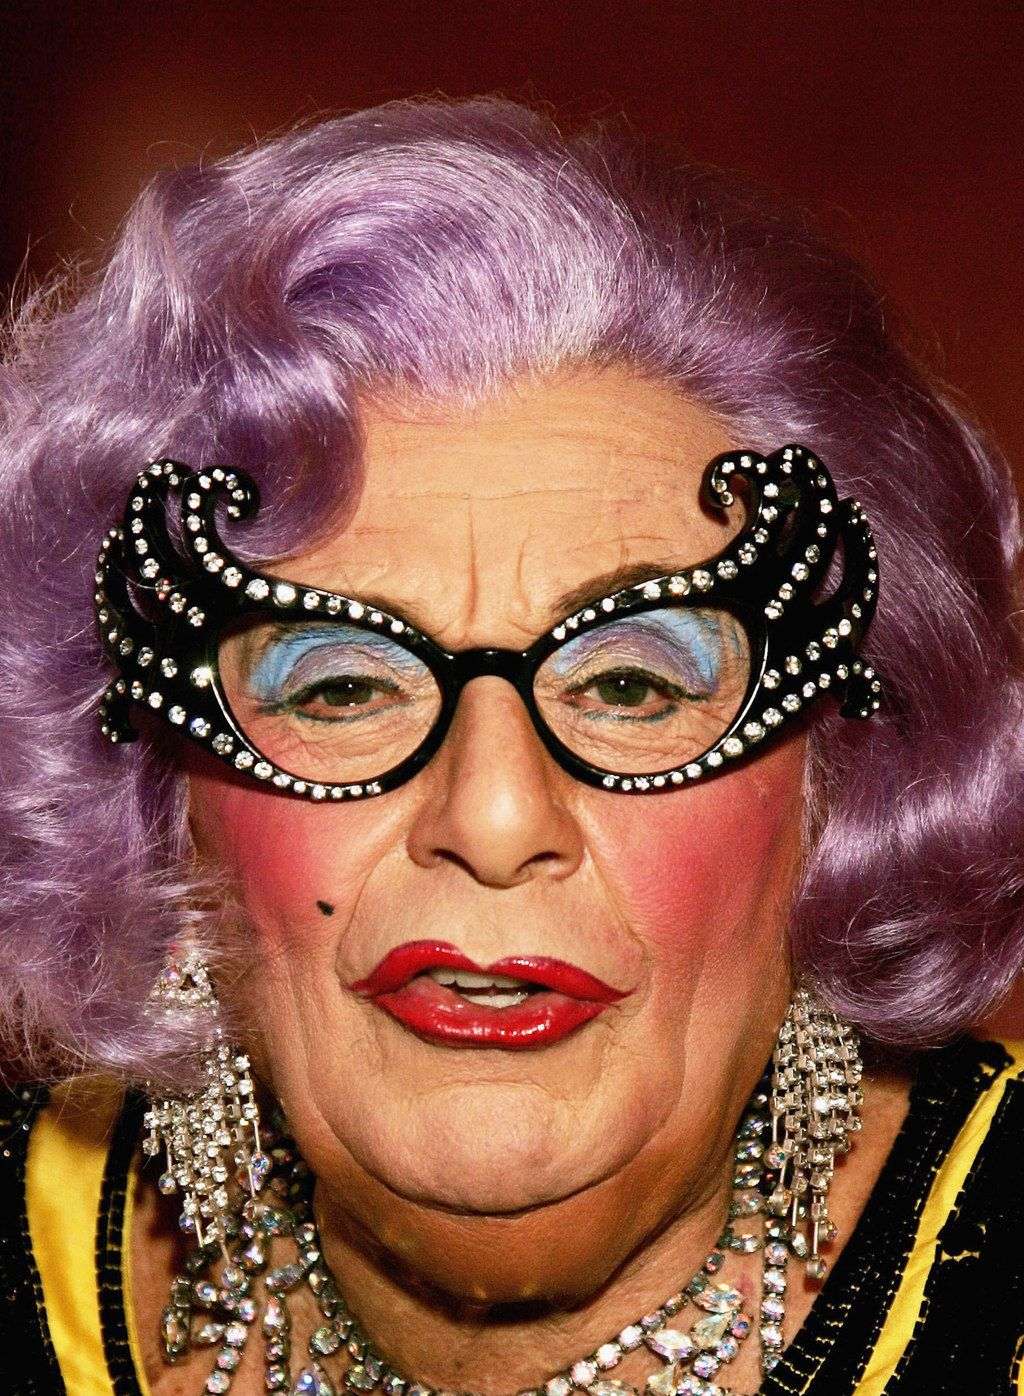 Dame Edna Everage Drag Queen Makeup 36063a659ed4f